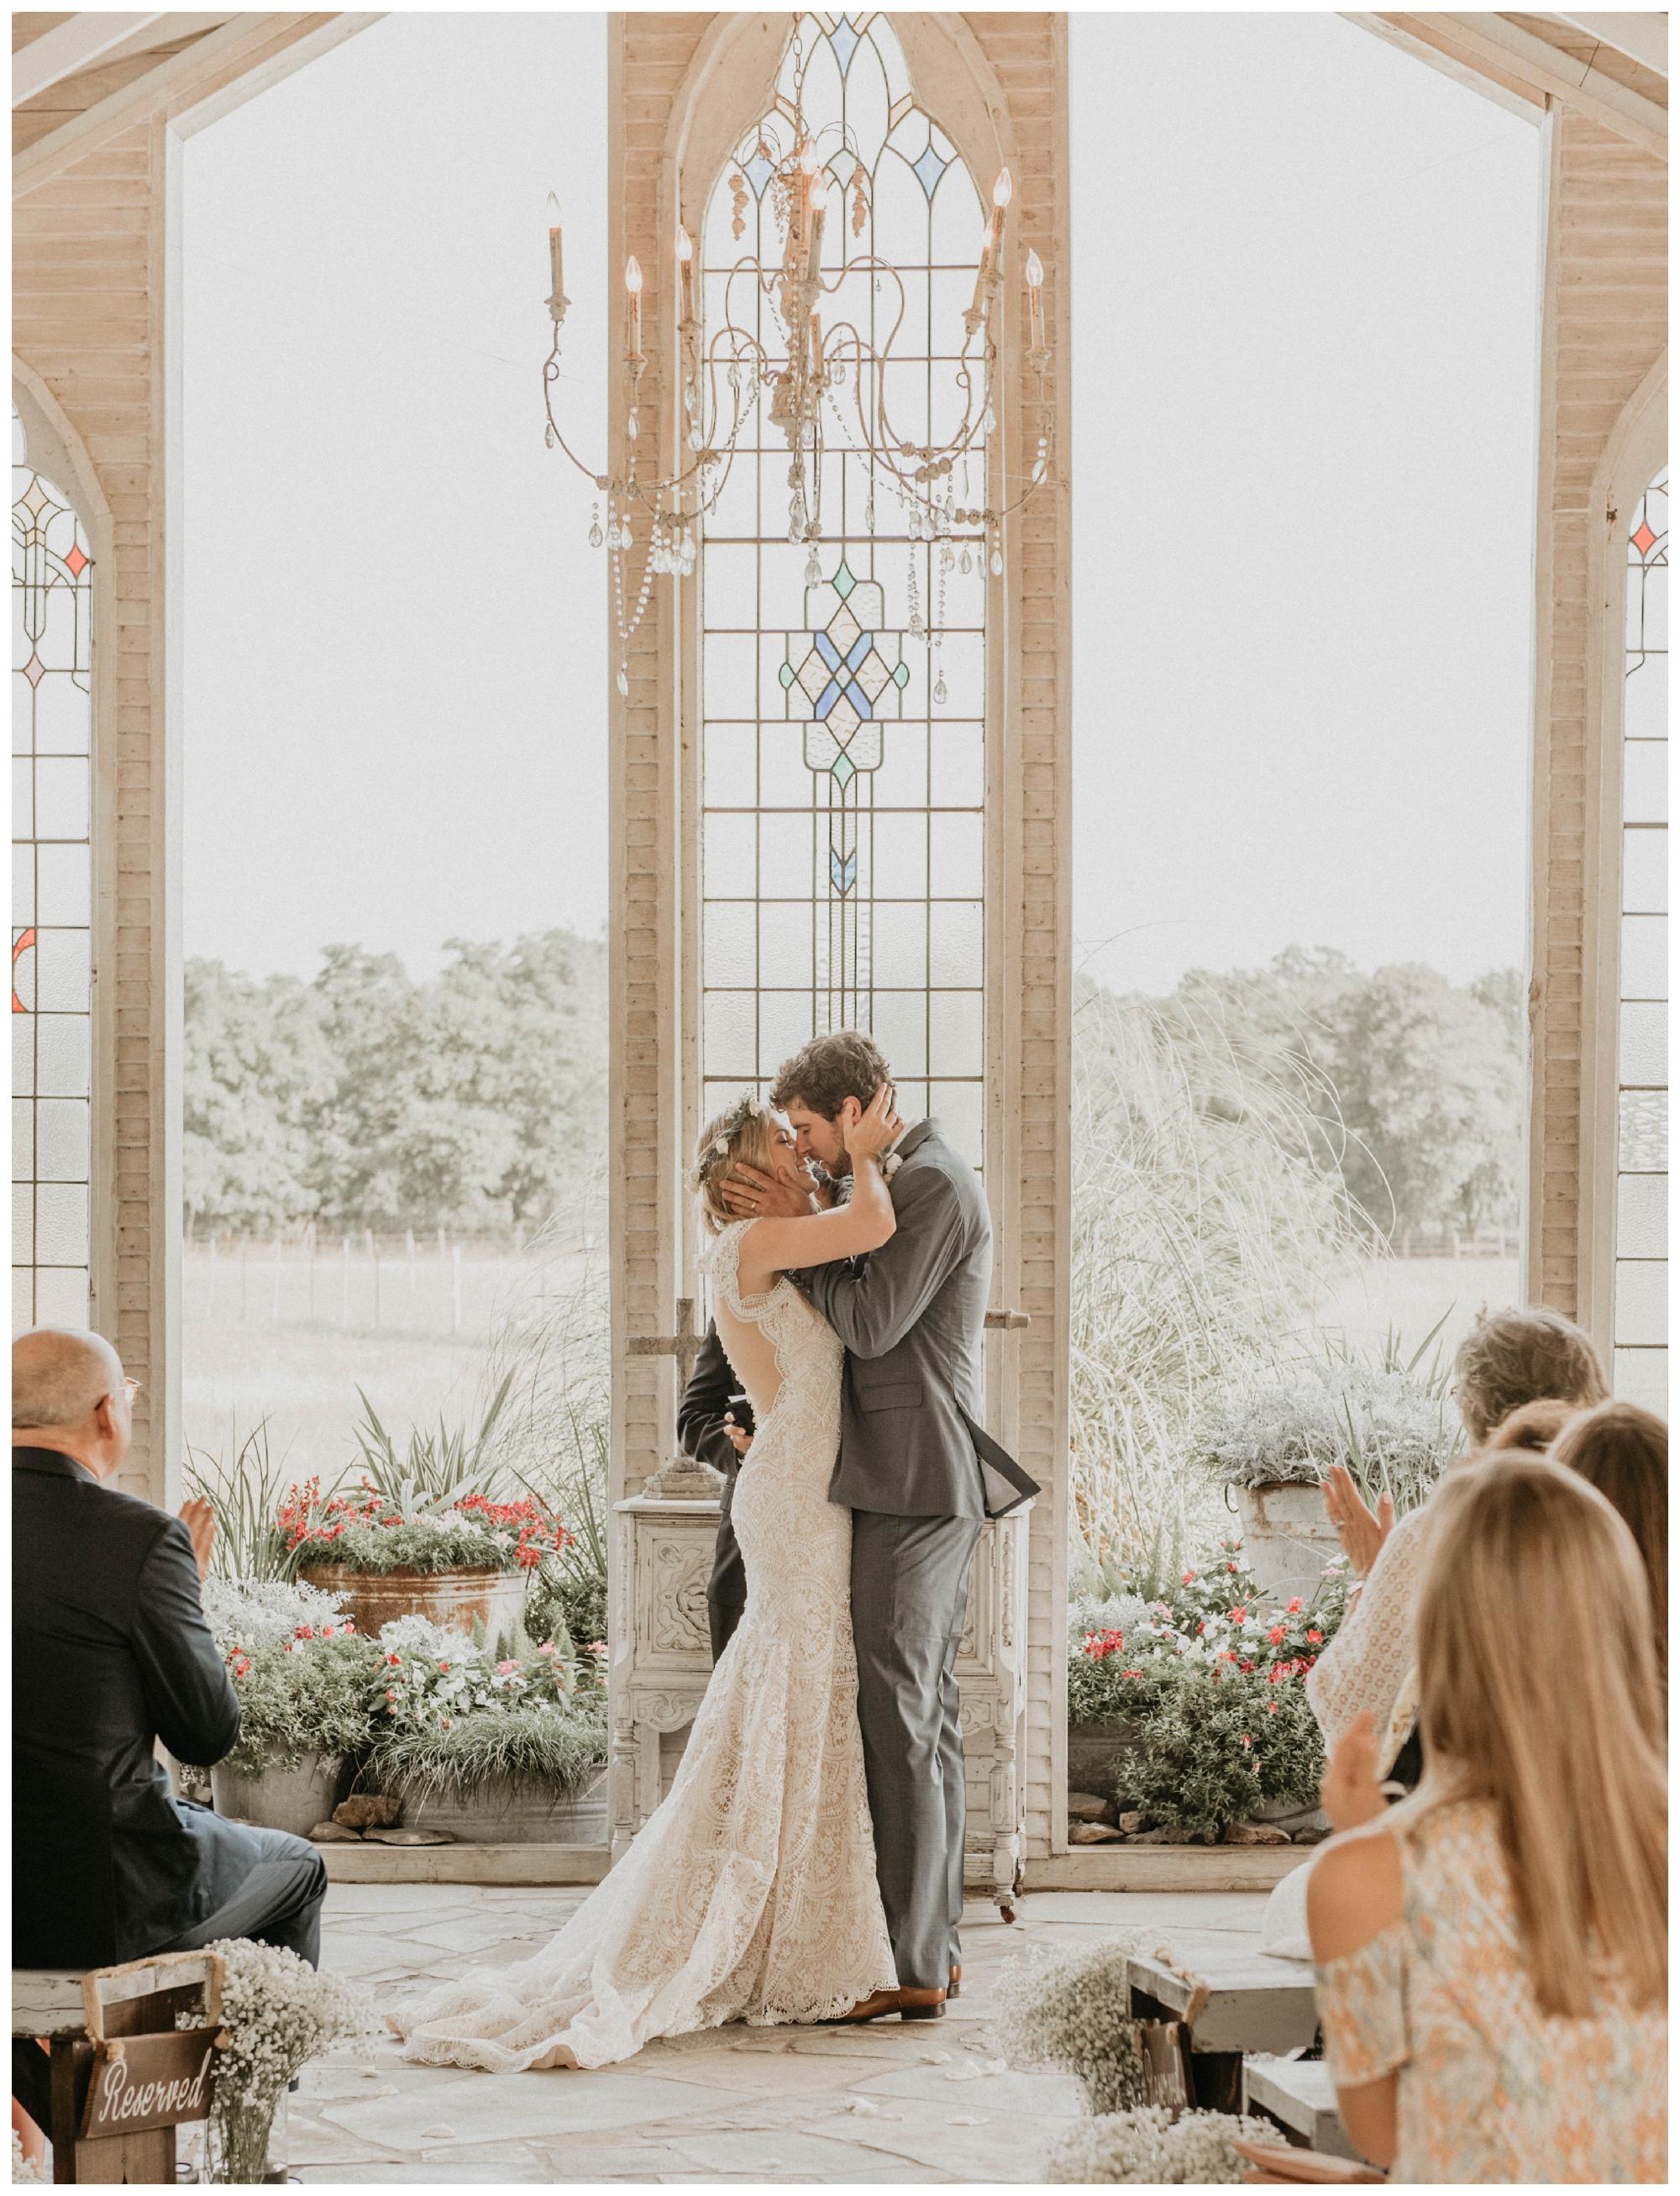 austin-texas-wedding-photography-1778-photographie_0089.jpg